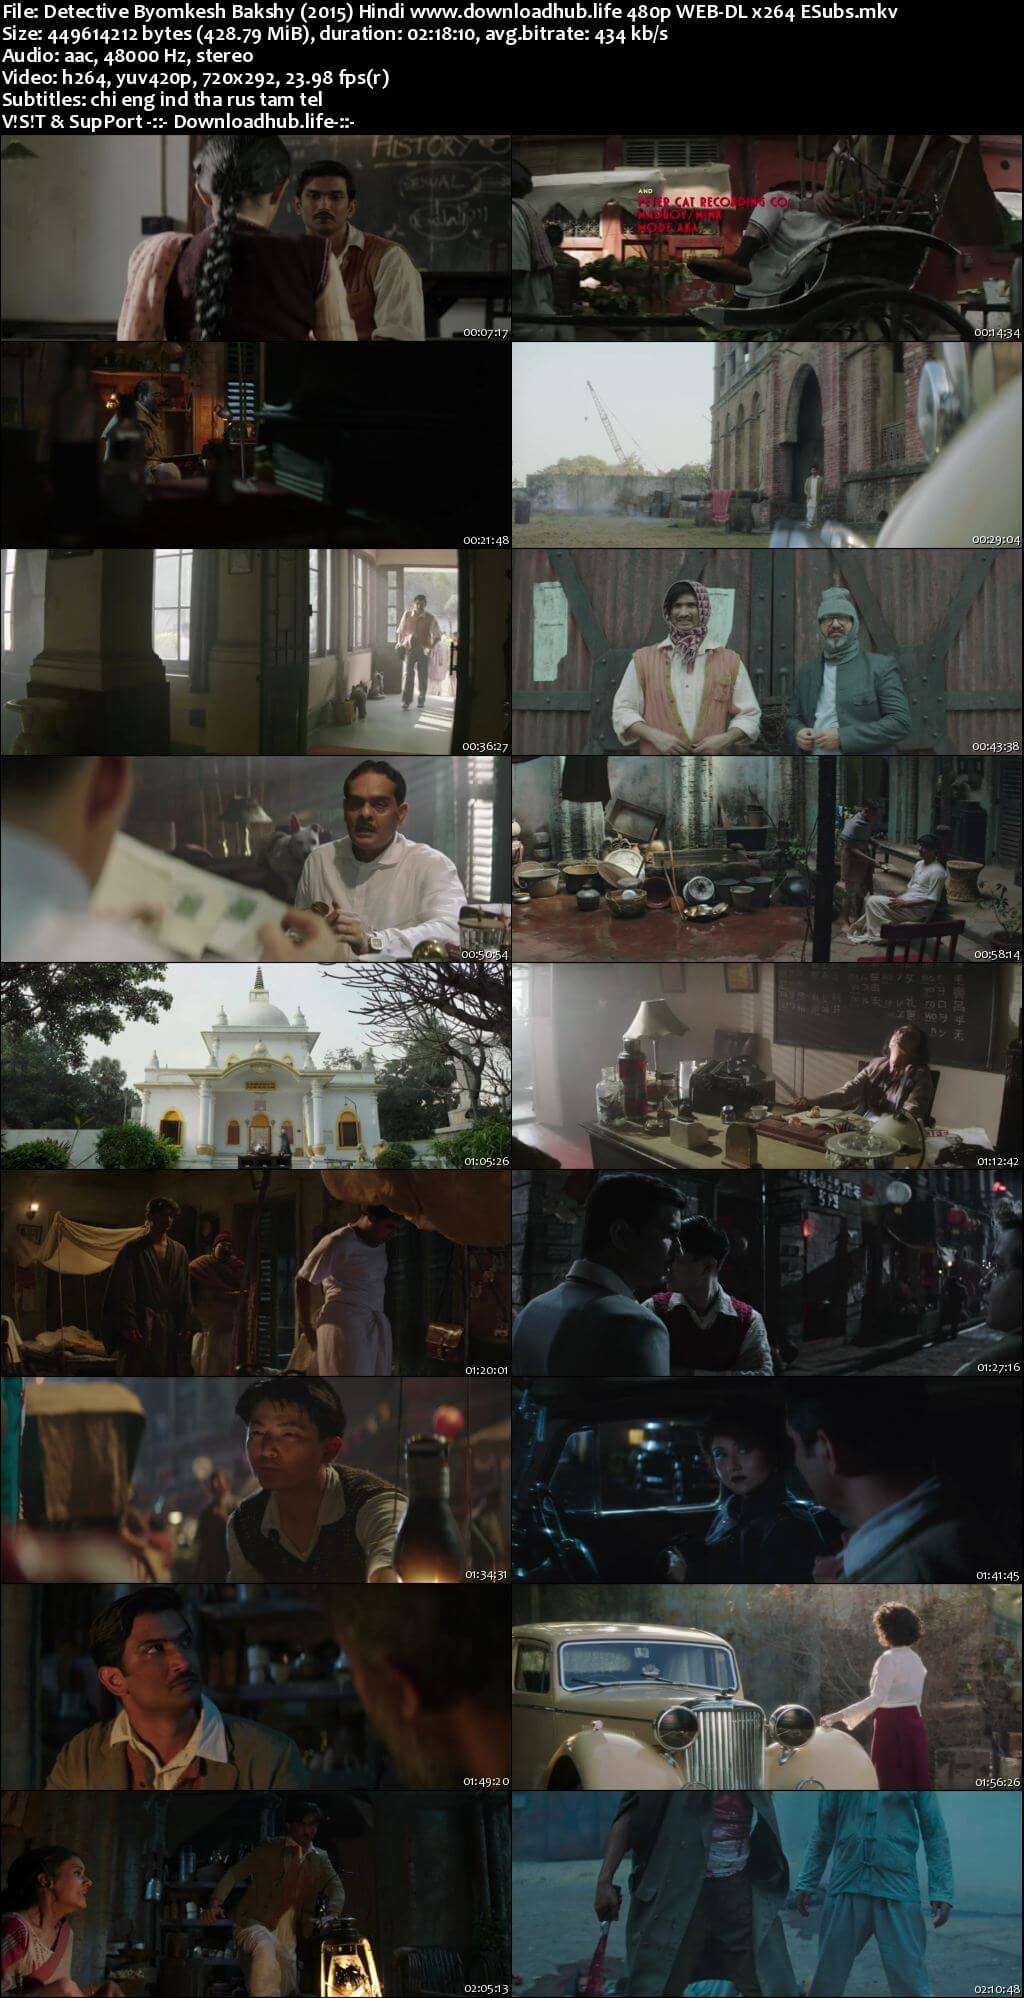 Detective Byomkesh Bakshi 2015 Full Movie In Hindi 480p